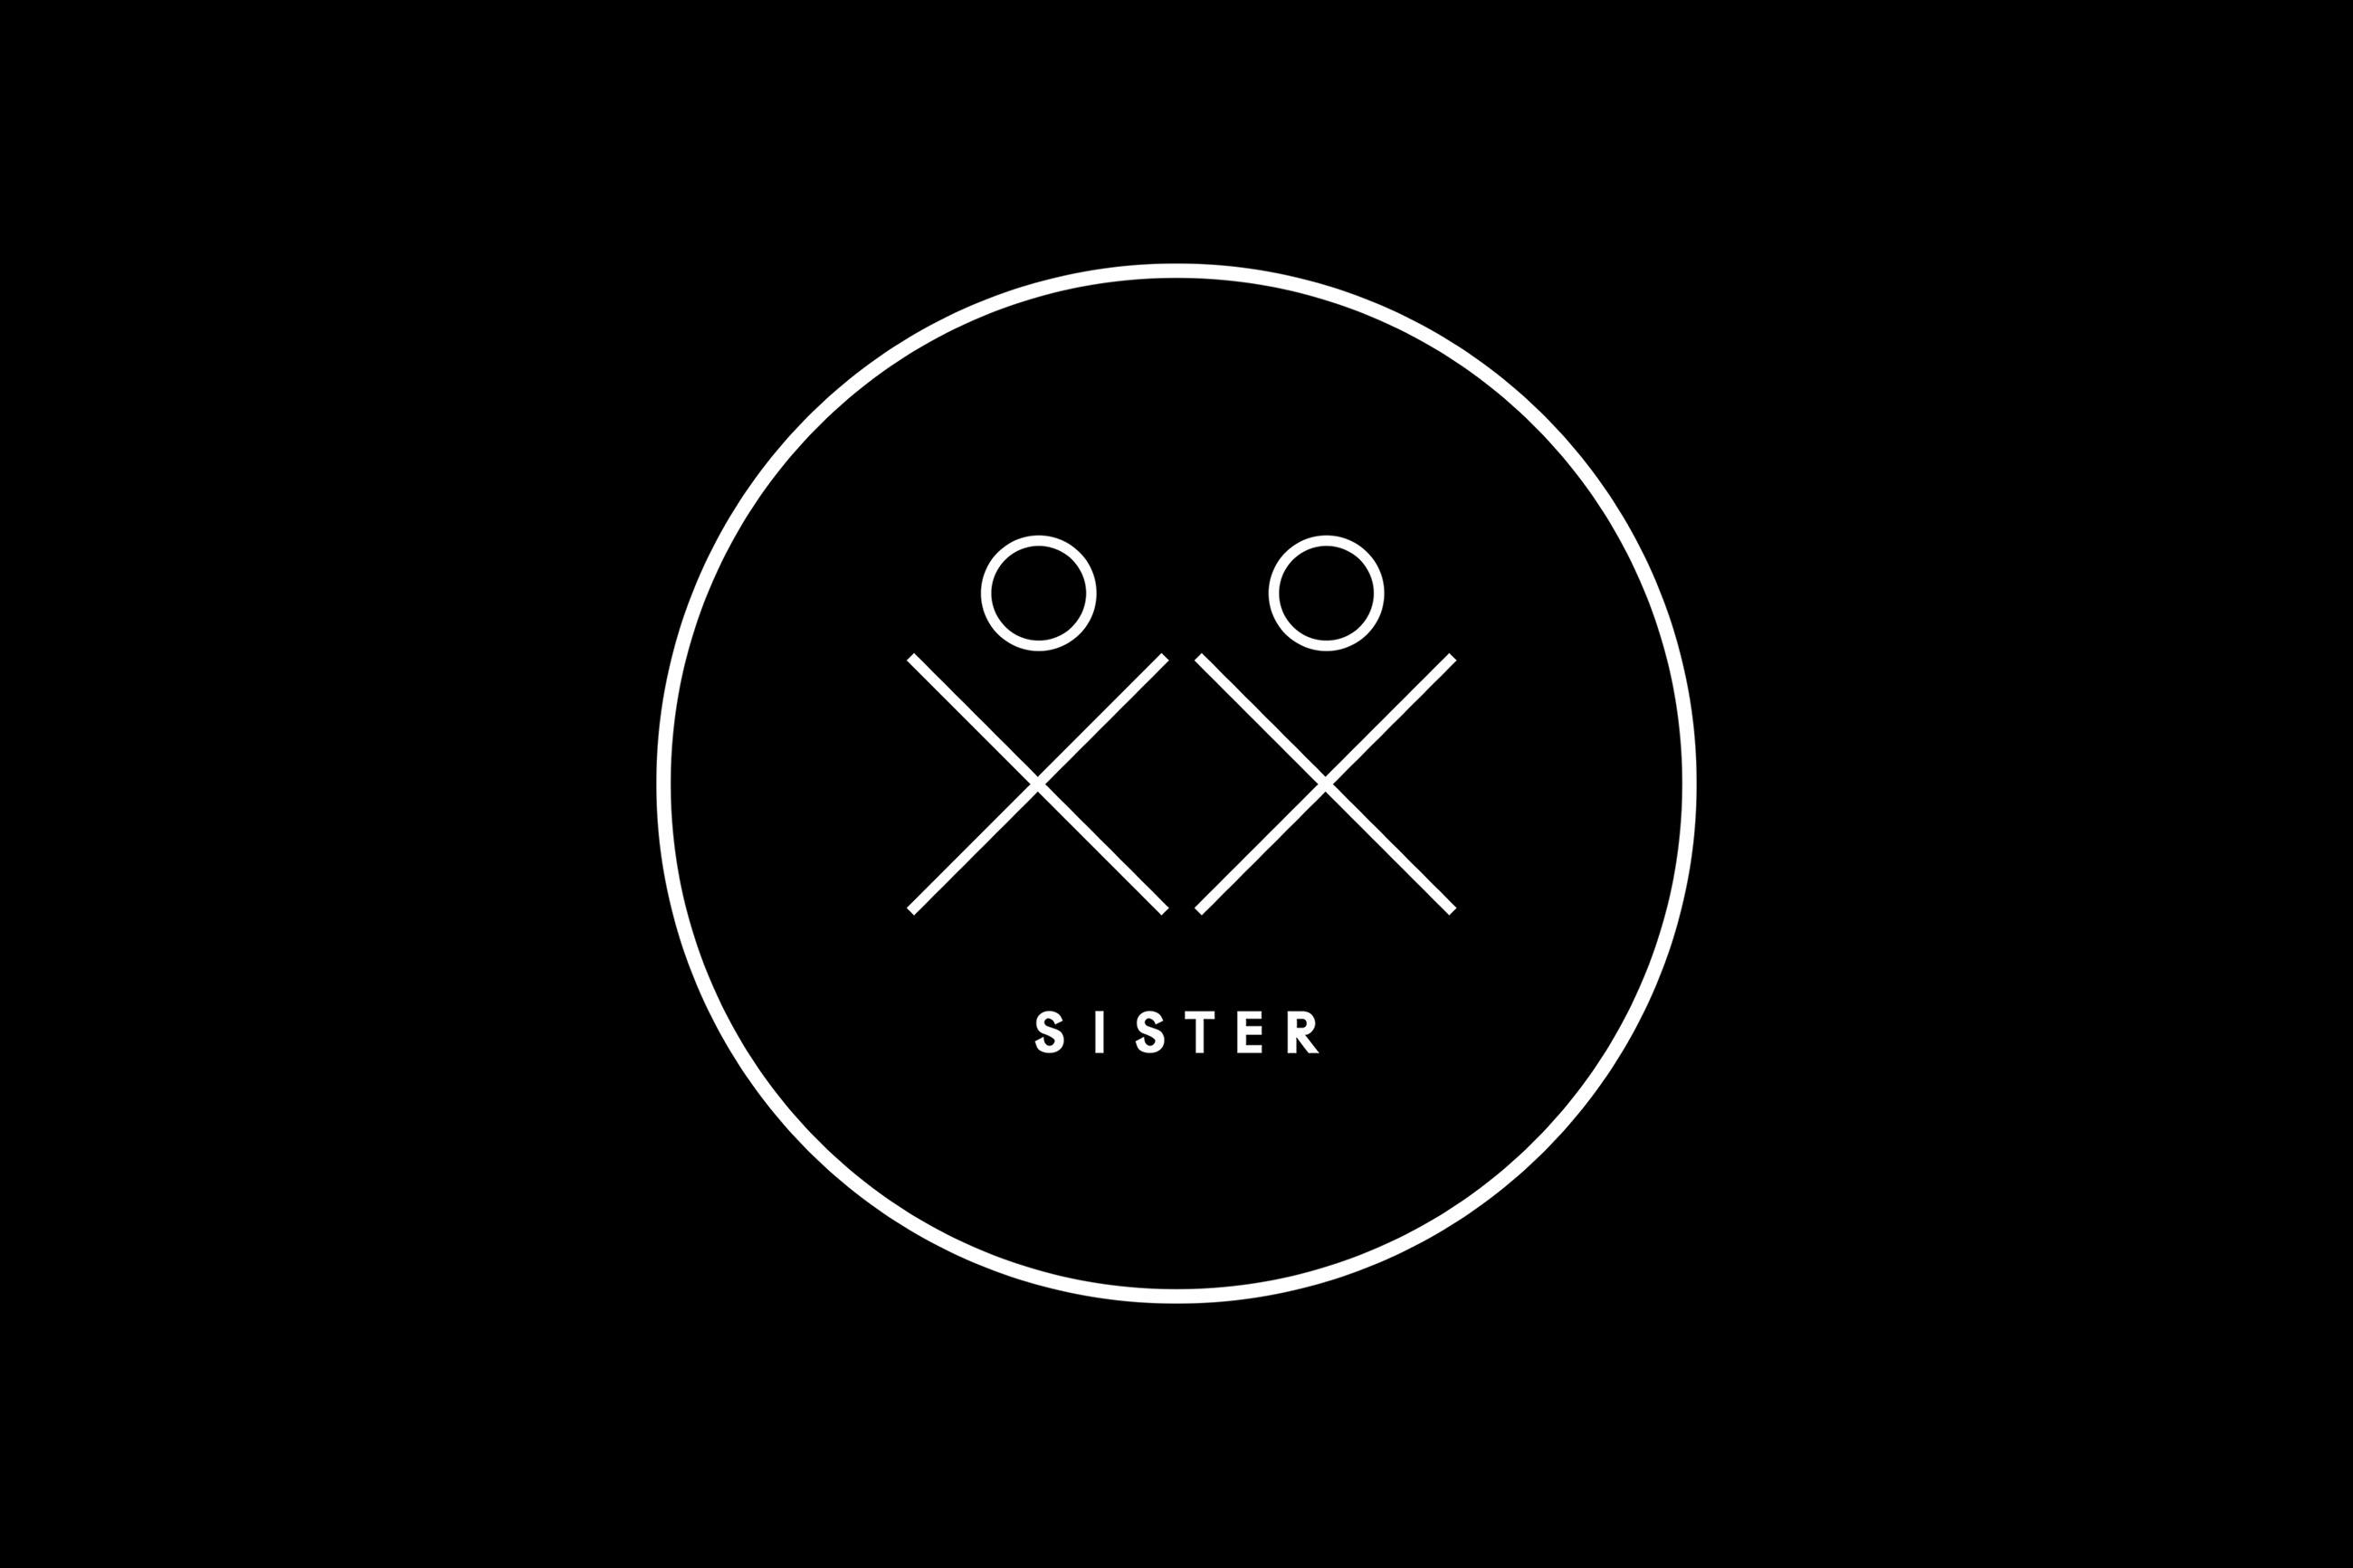 sister-radio-pyroradio-carly-wilford-pyroradio-com-pyro-pyro-radio-siggy-smalls-shan-mcginley